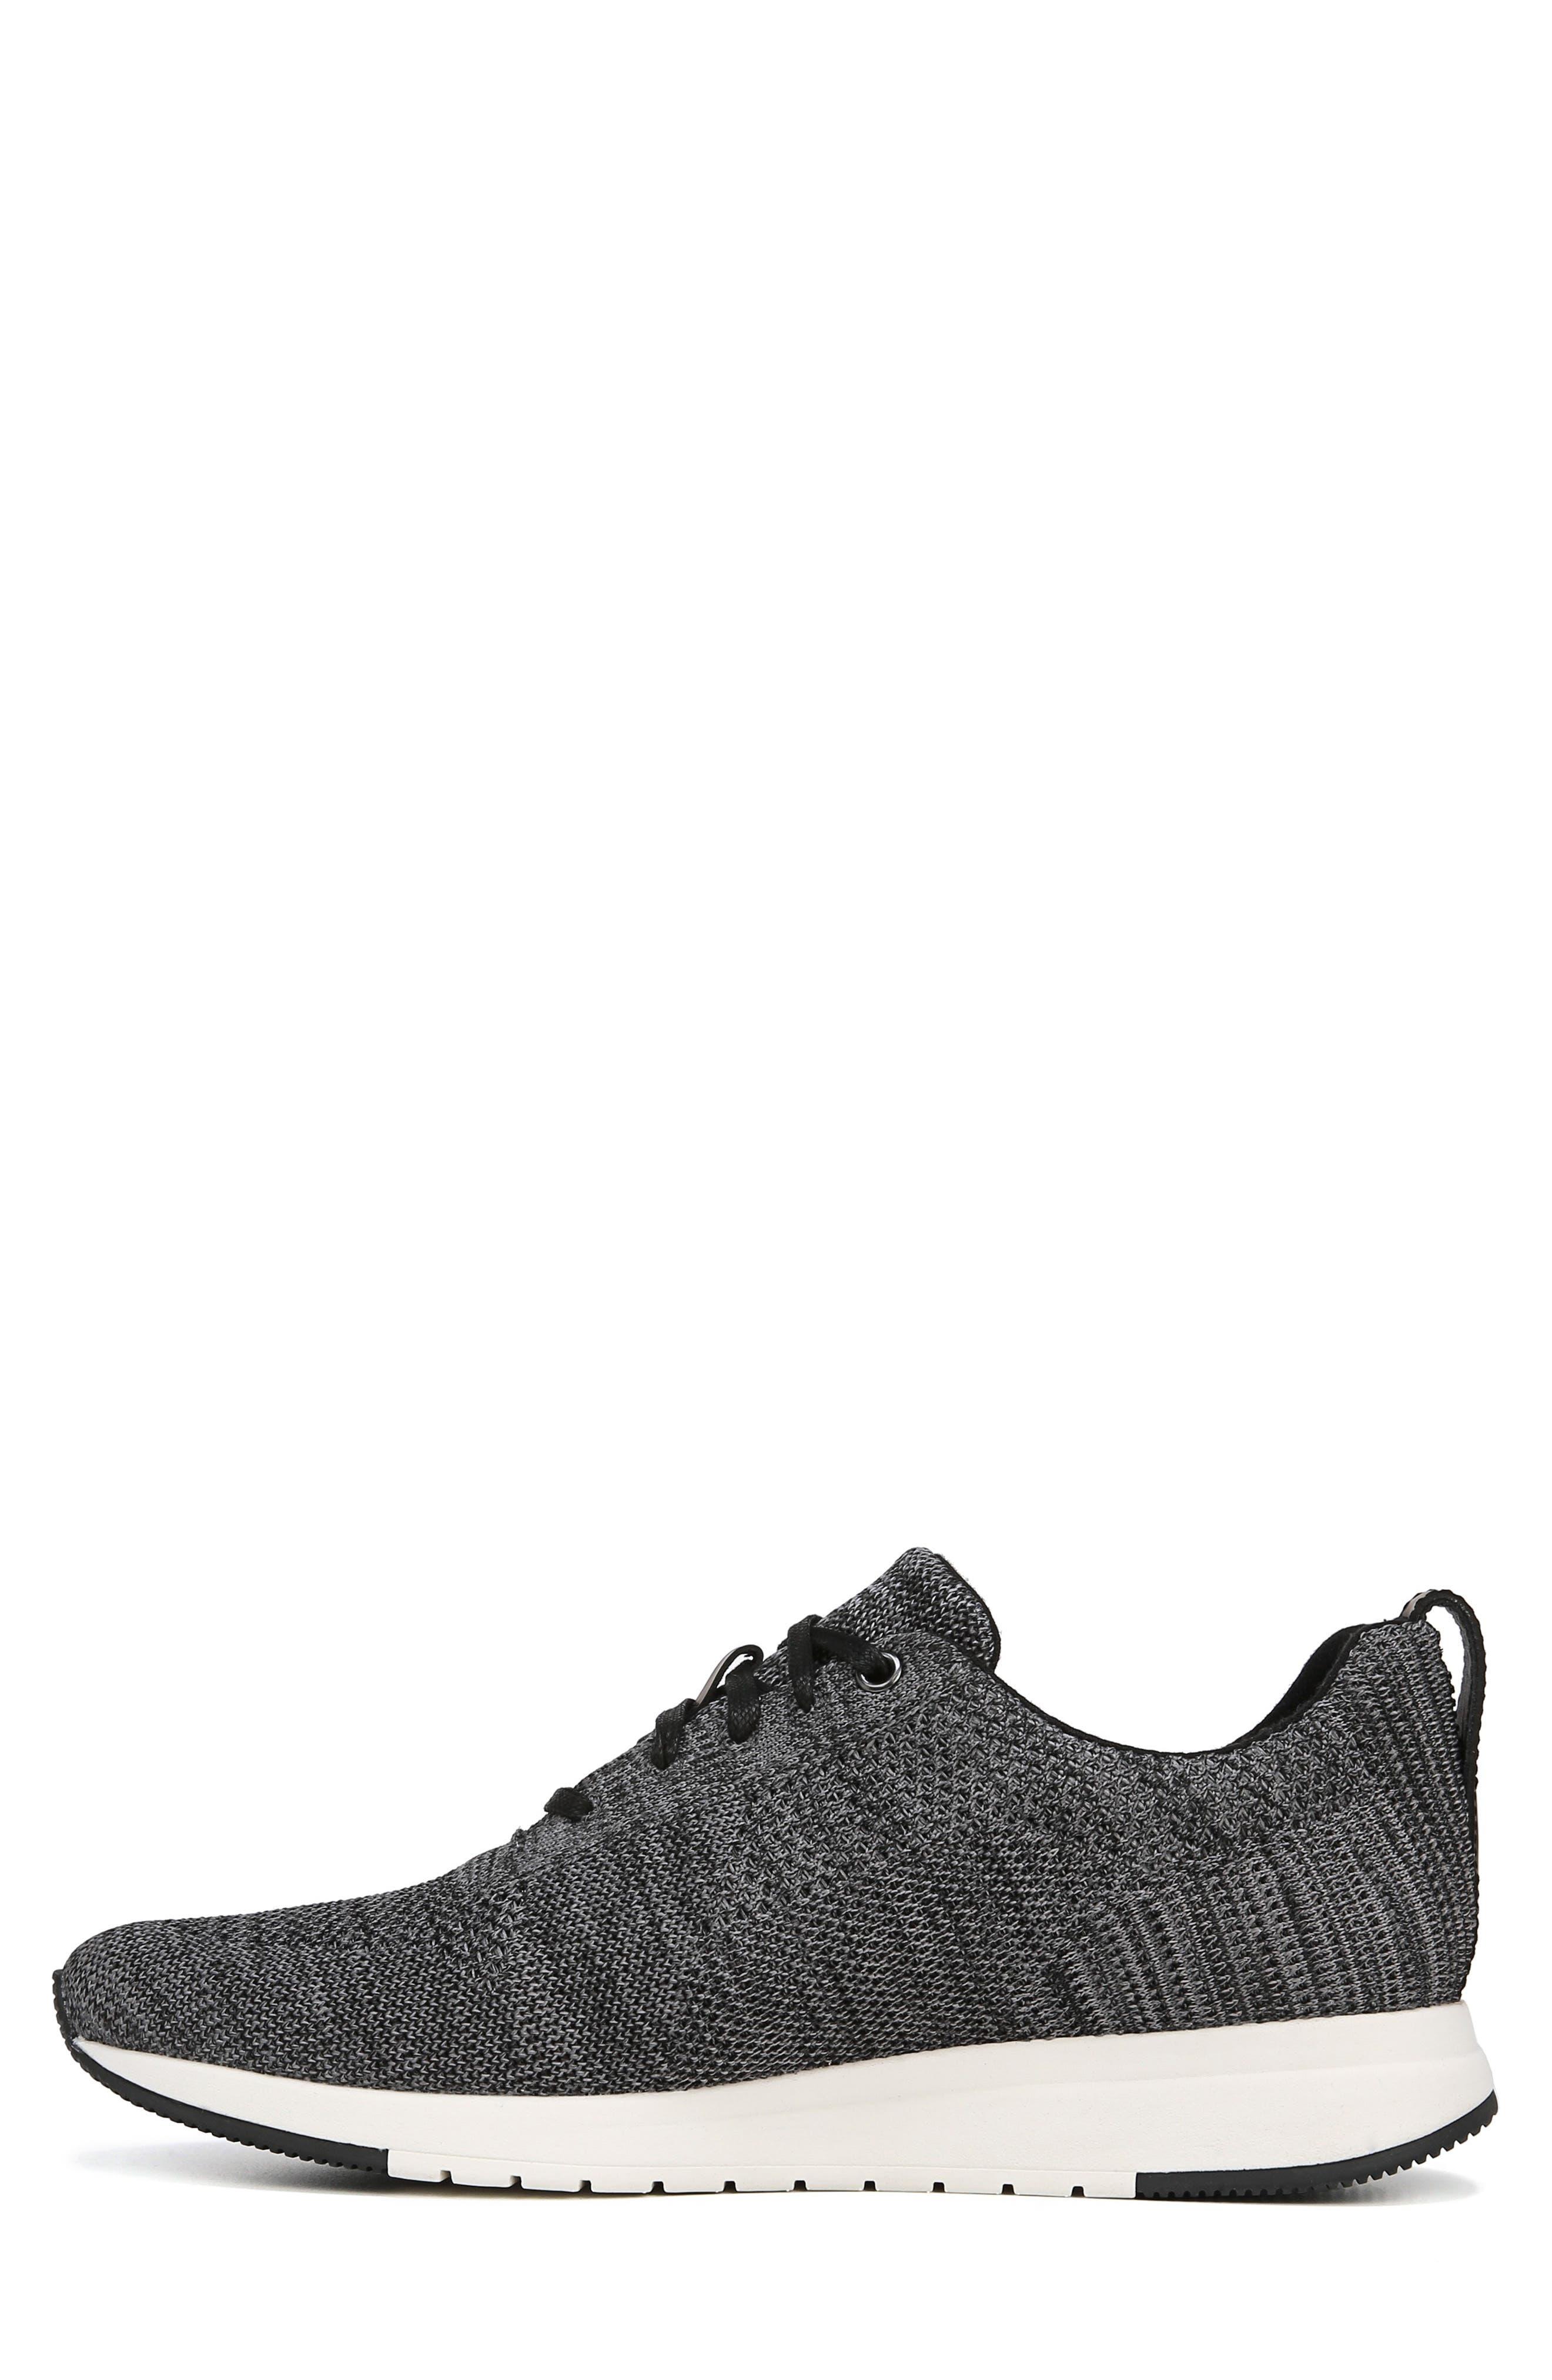 Palo Knit Sneaker,                             Alternate thumbnail 8, color,                             MARL GREY/ BLACK